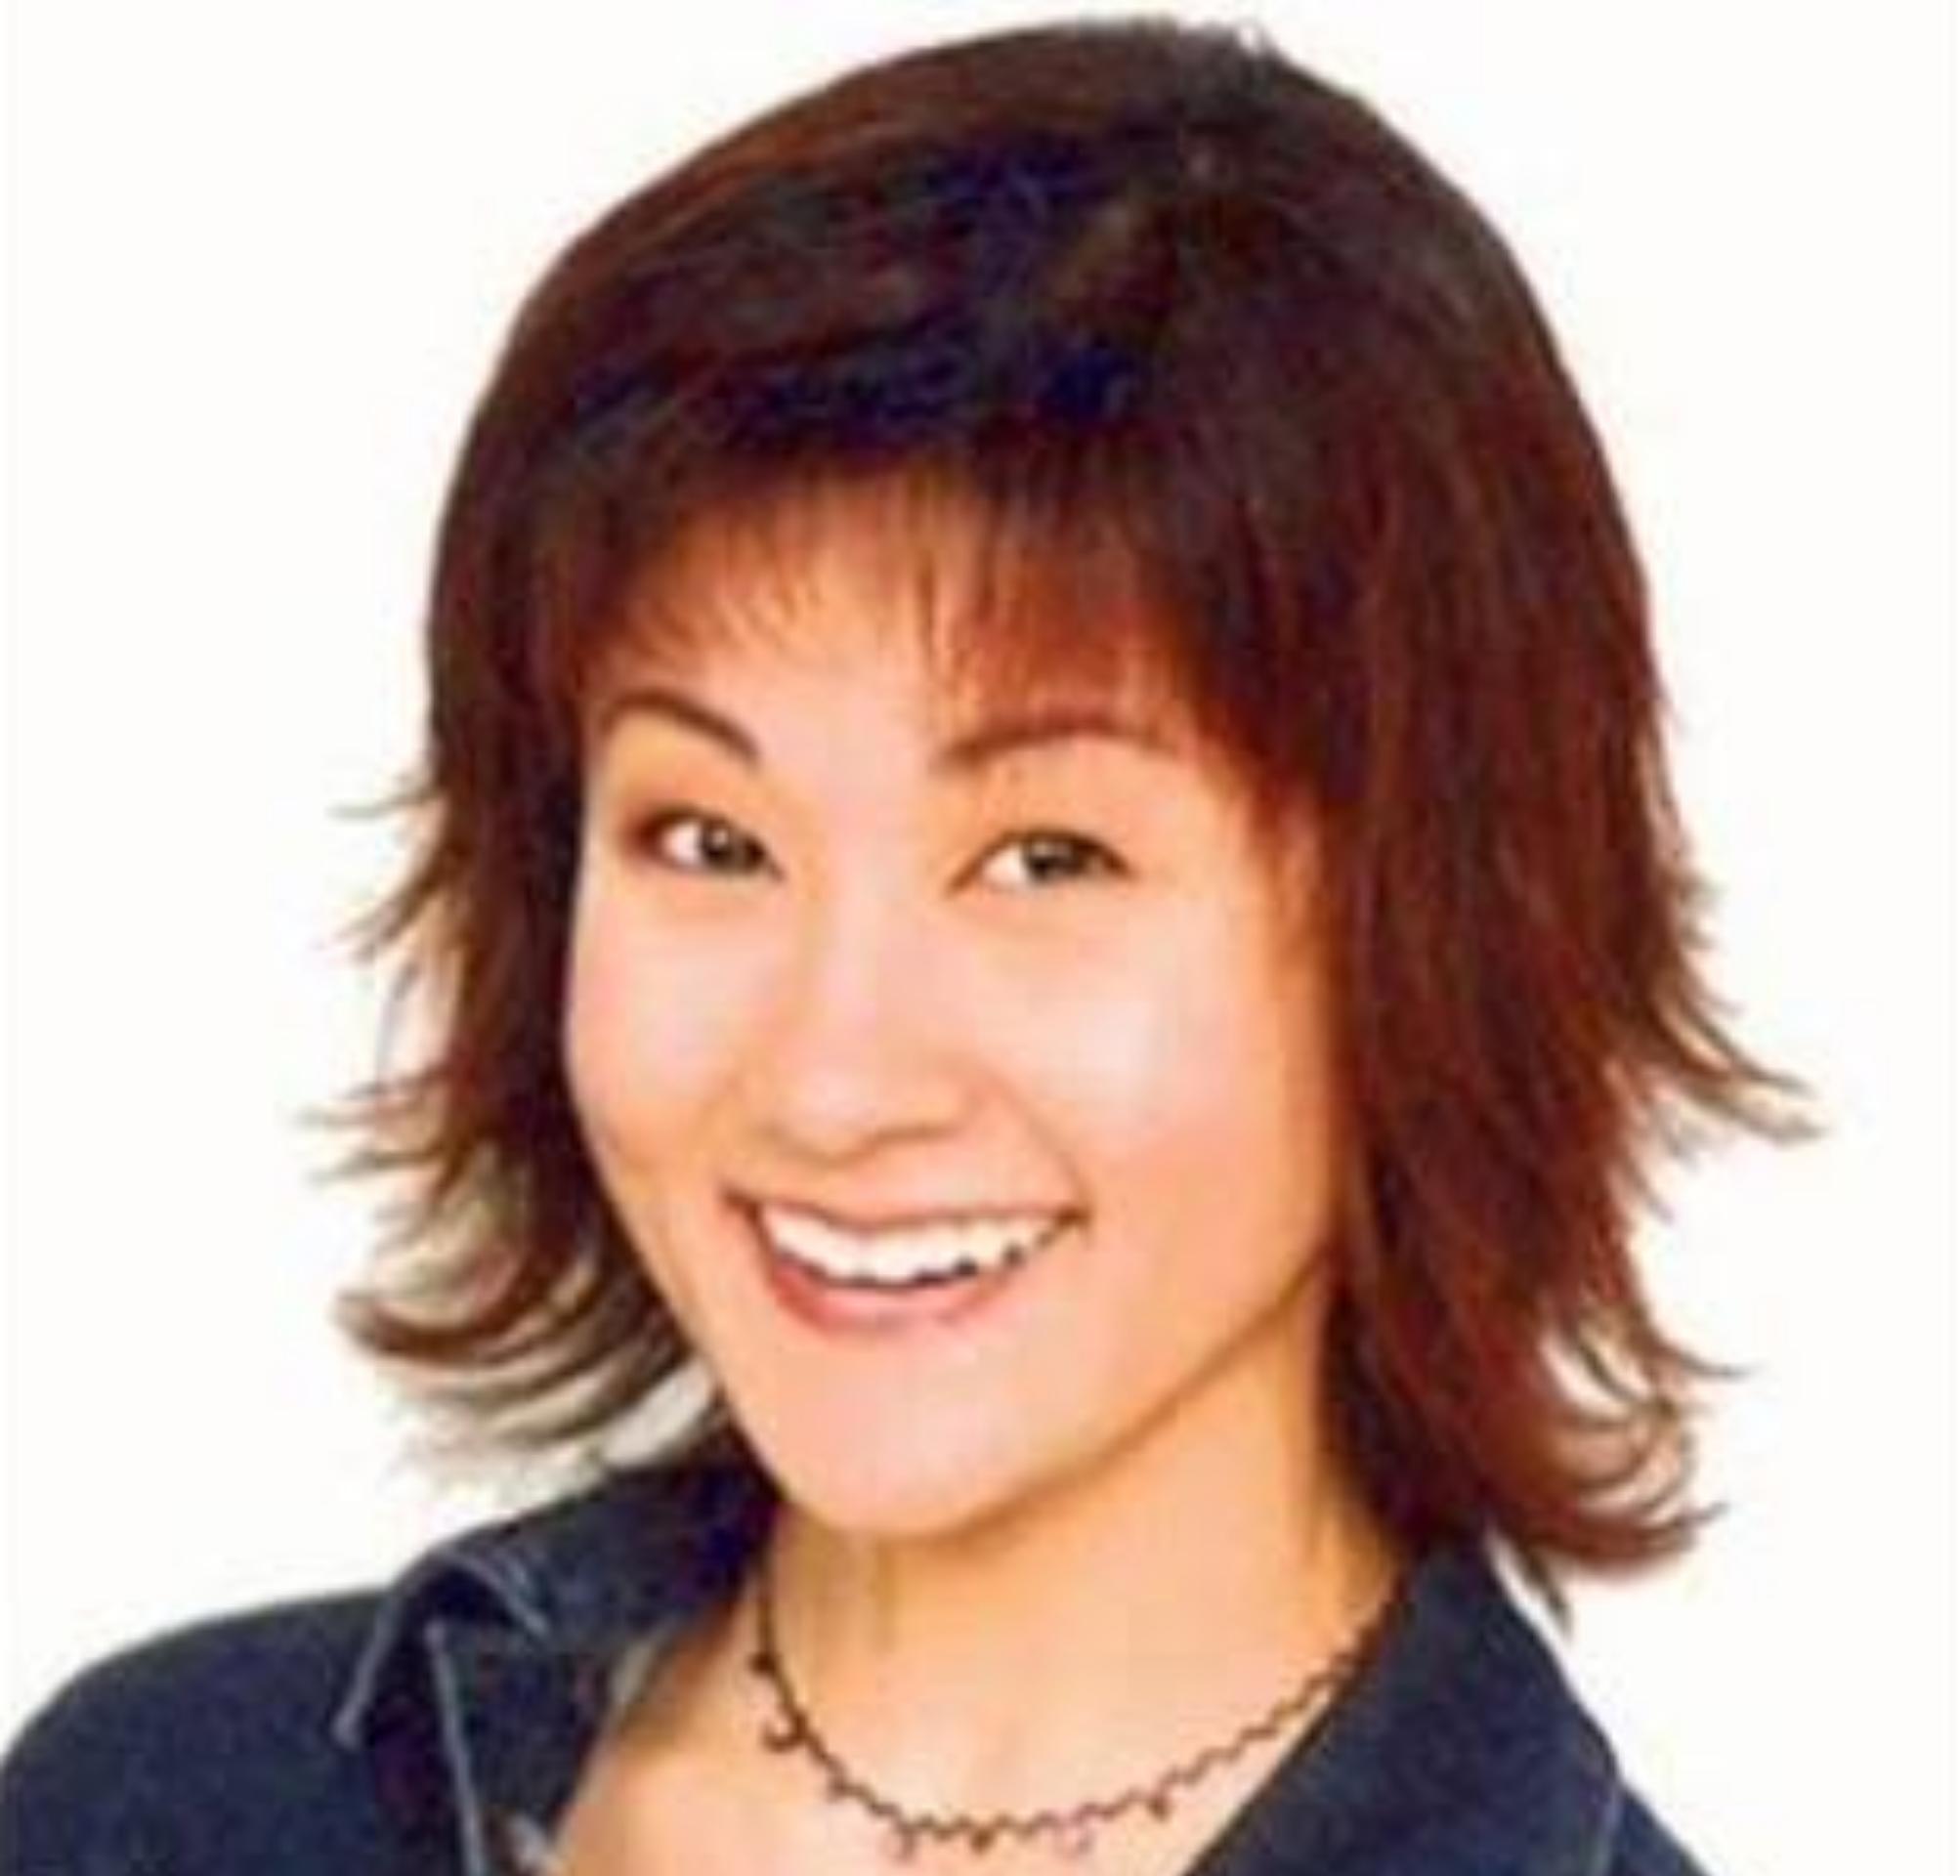 [SEIYUU] Tomoko Kawakami Tomoko_Kawakami